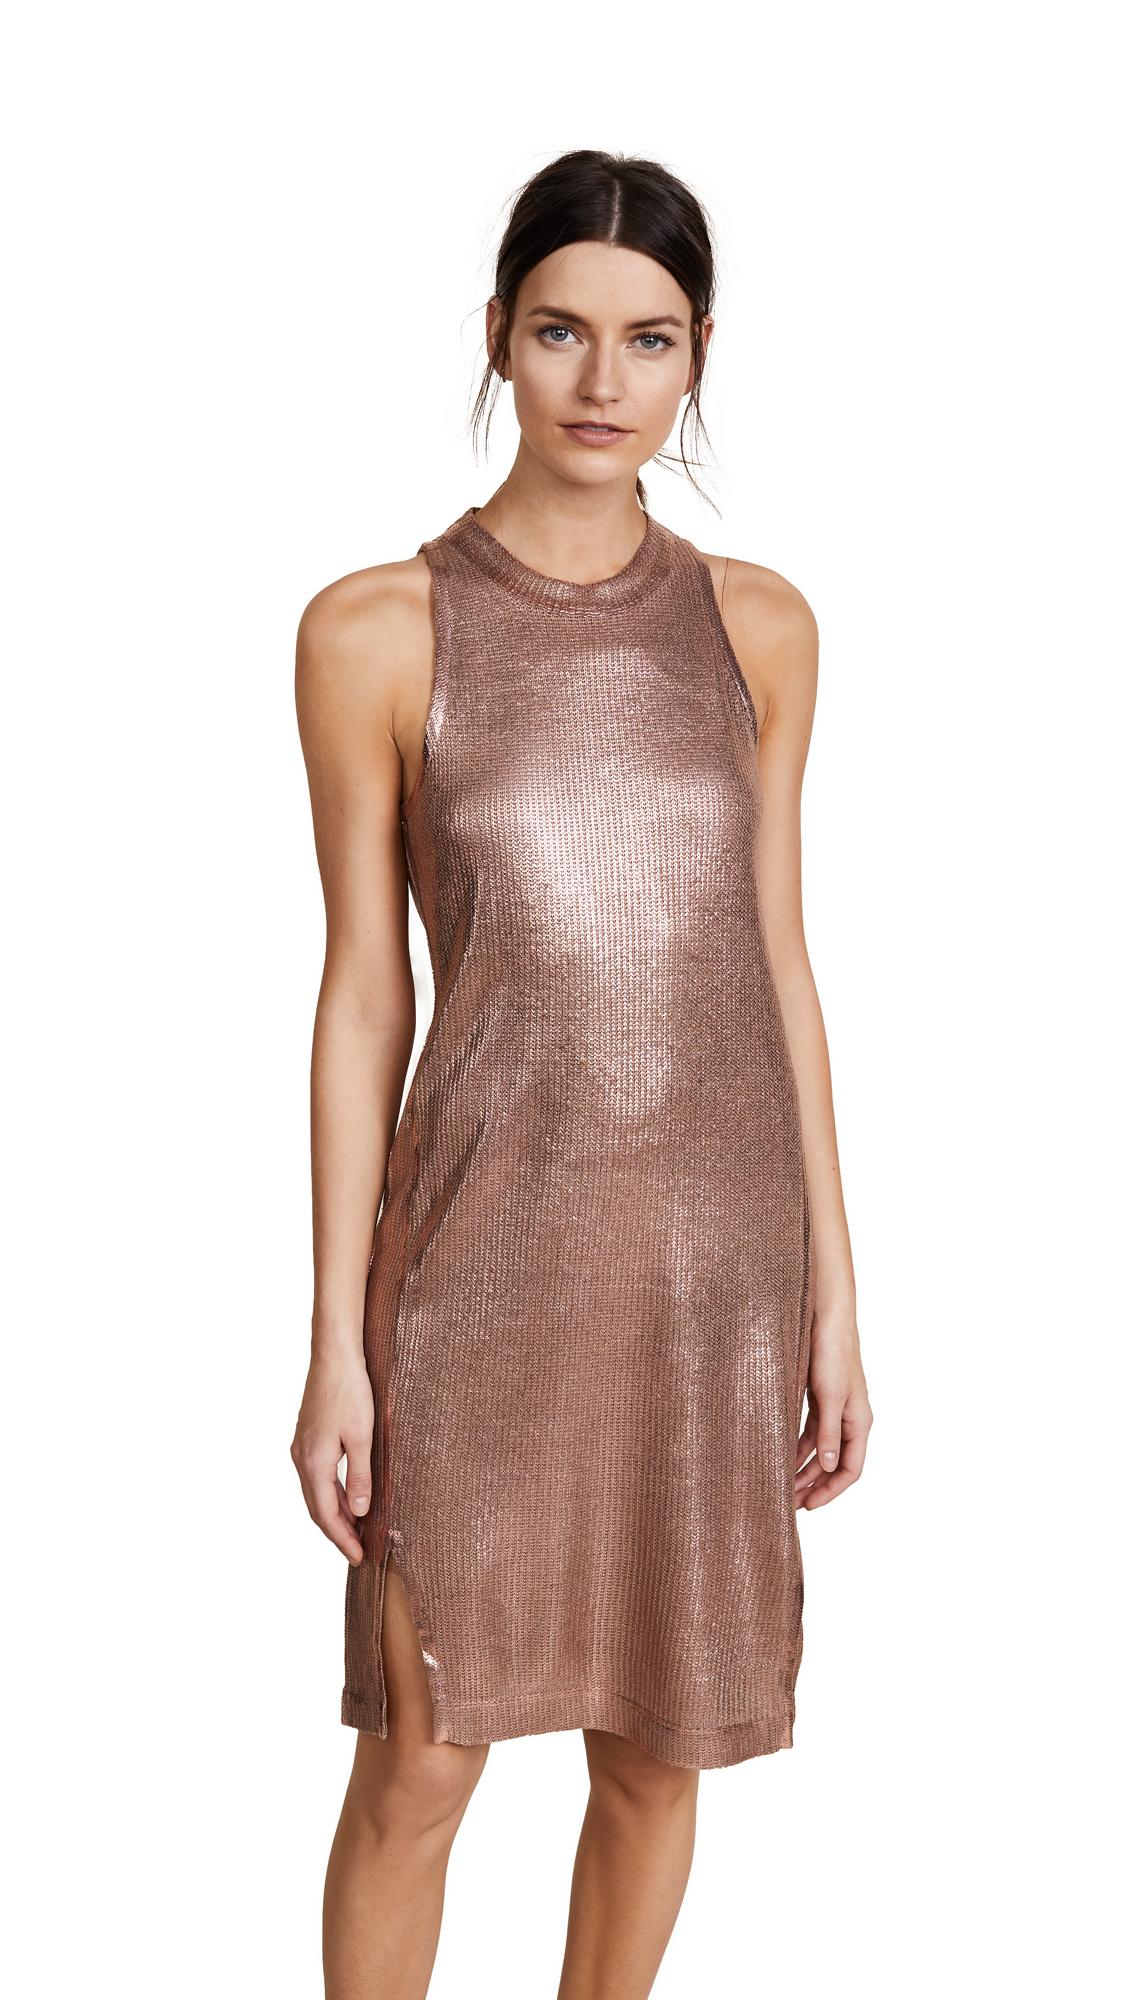 Splendid Astor Metallic Coated Knit Dress